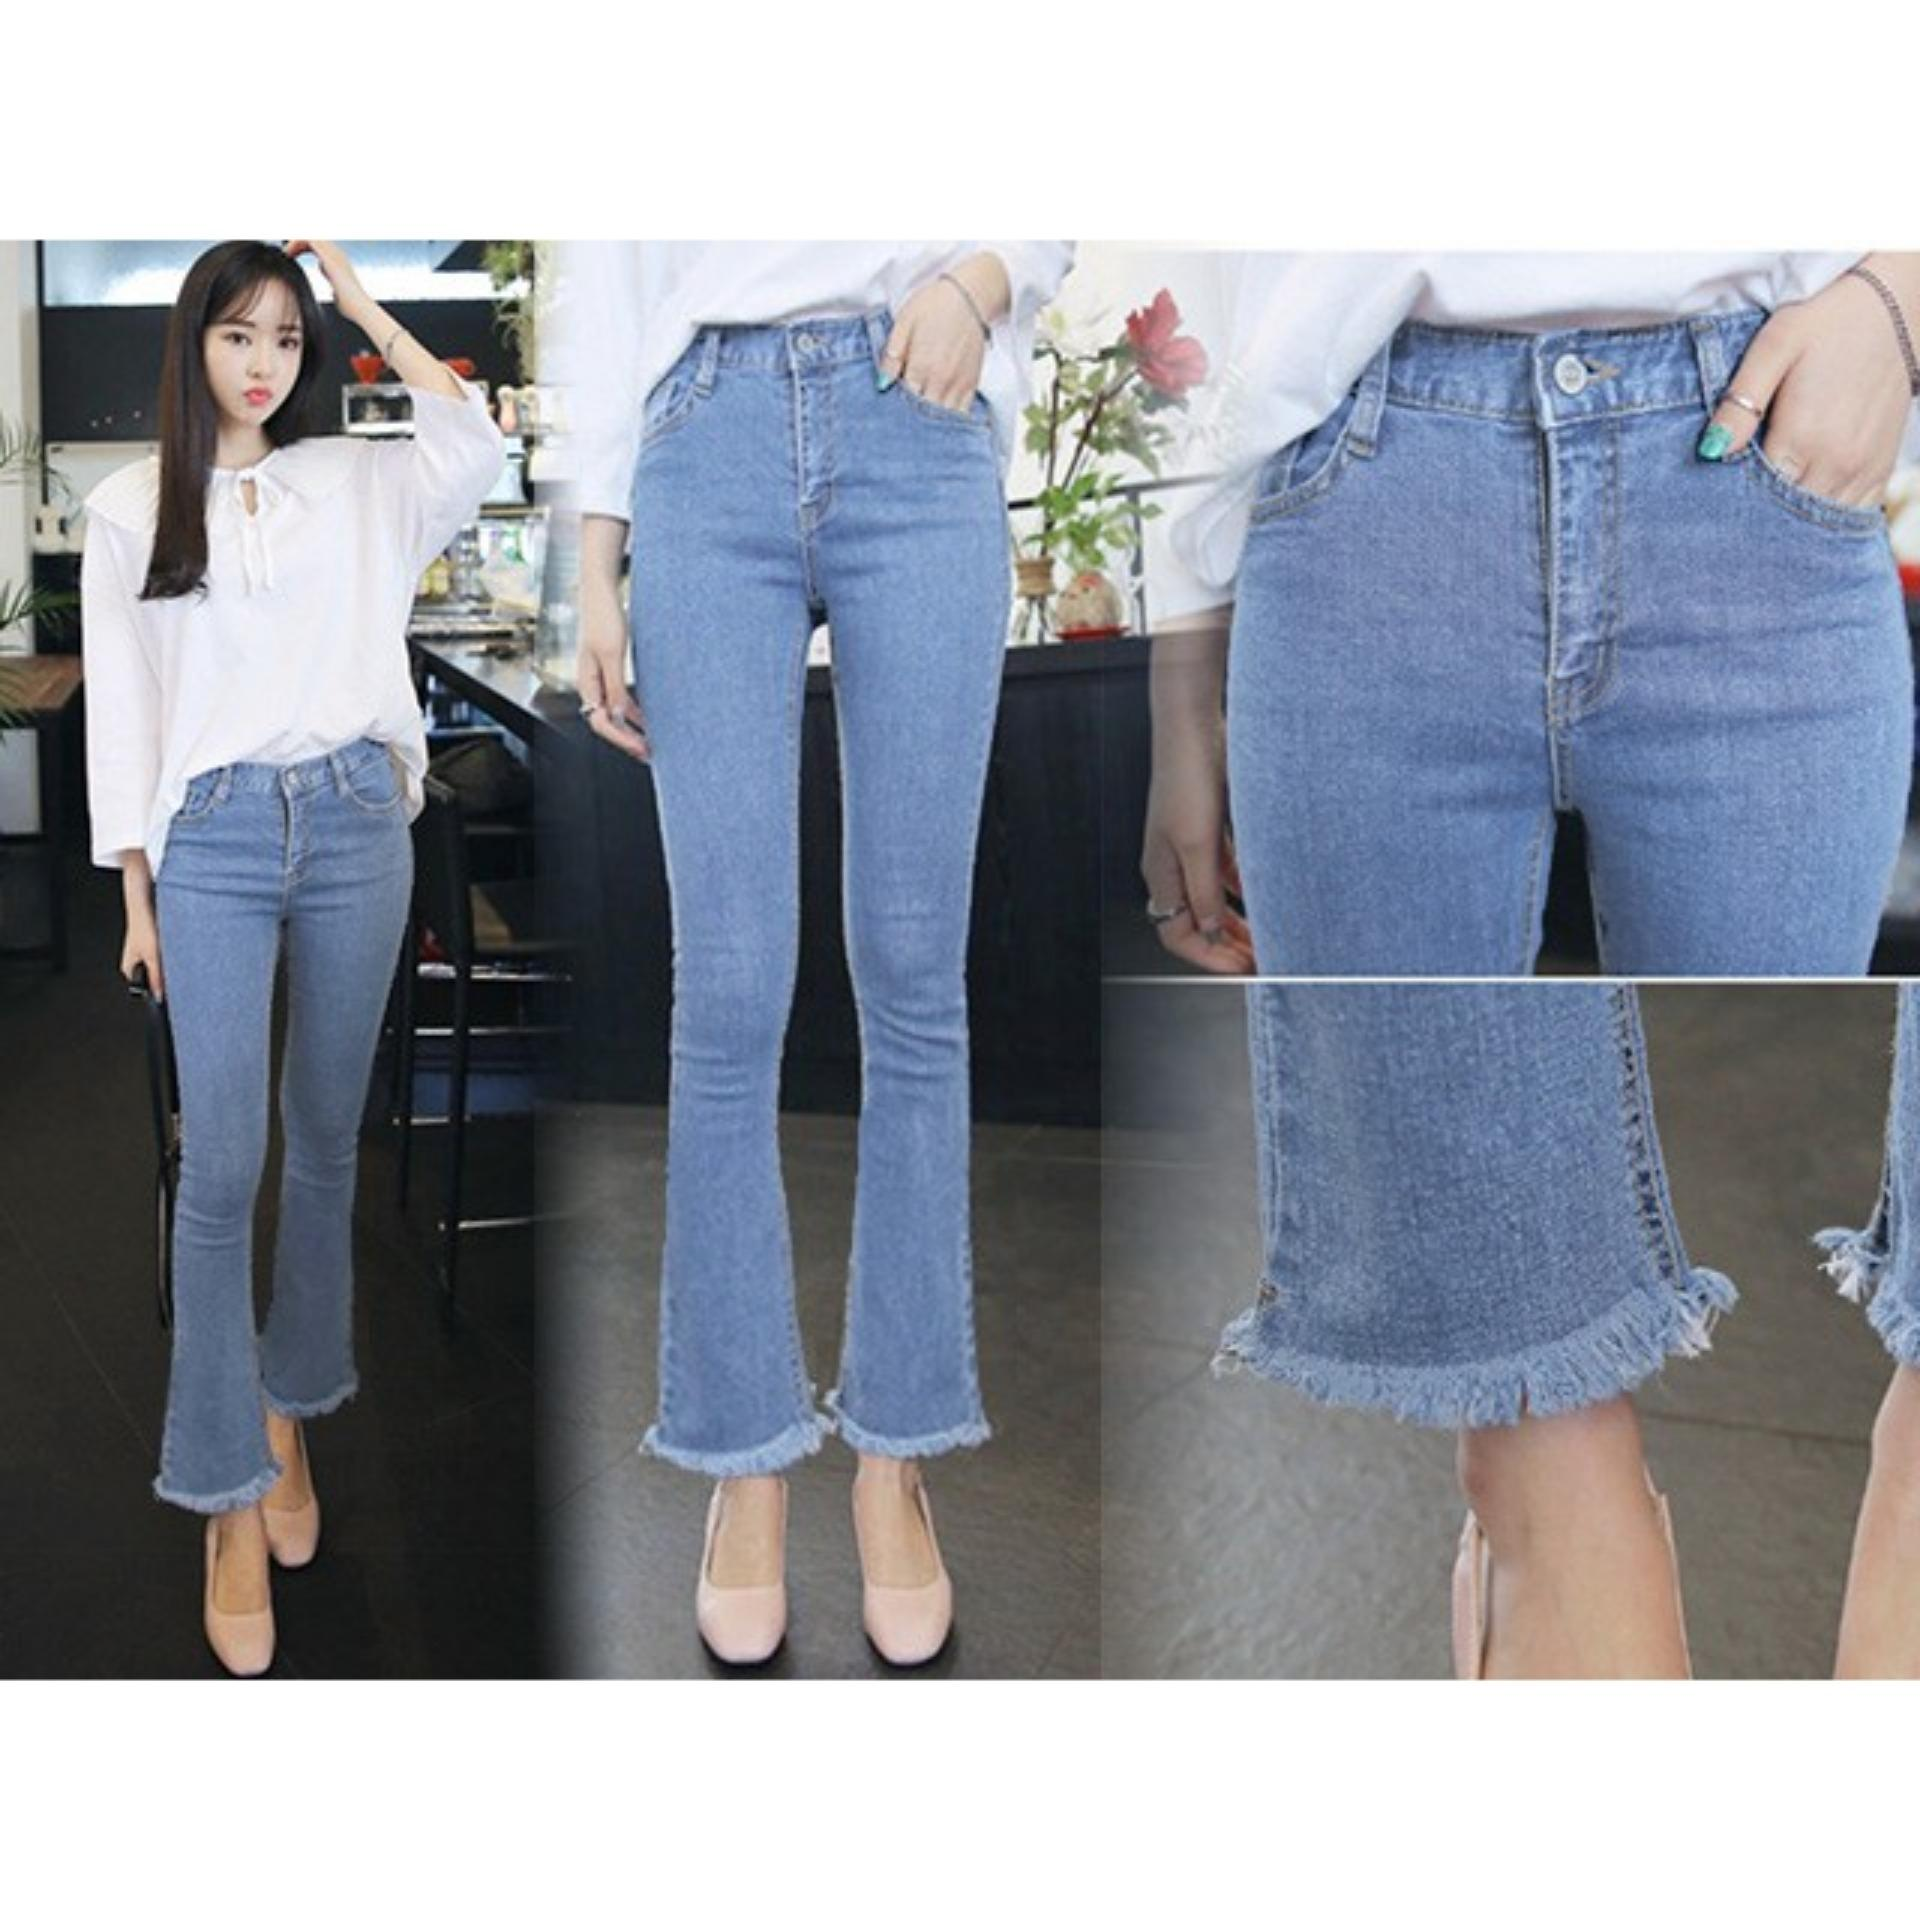 Celana Jeans CUTBRAY High Quality Biru Telor Asin